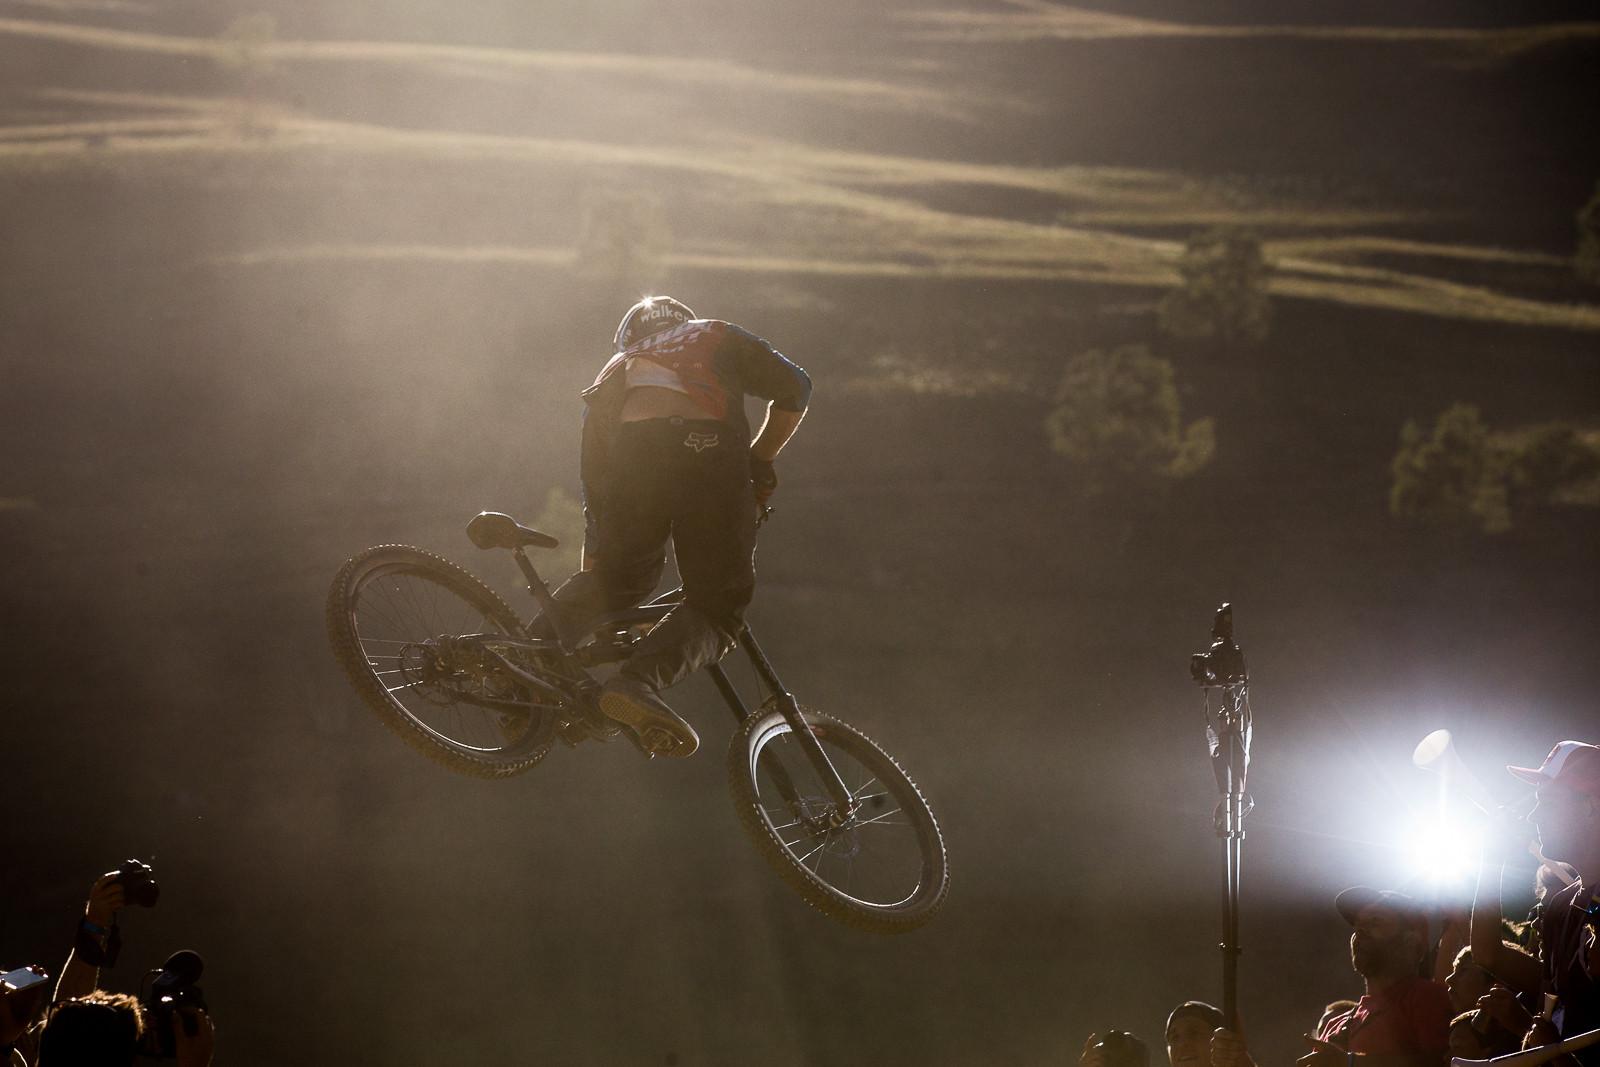 Matt Walker? Whip Off European Champs, Crankworx L2A - Whip Off European Champs, Crankworx L2A - Mountain Biking Pictures - Vital MTB